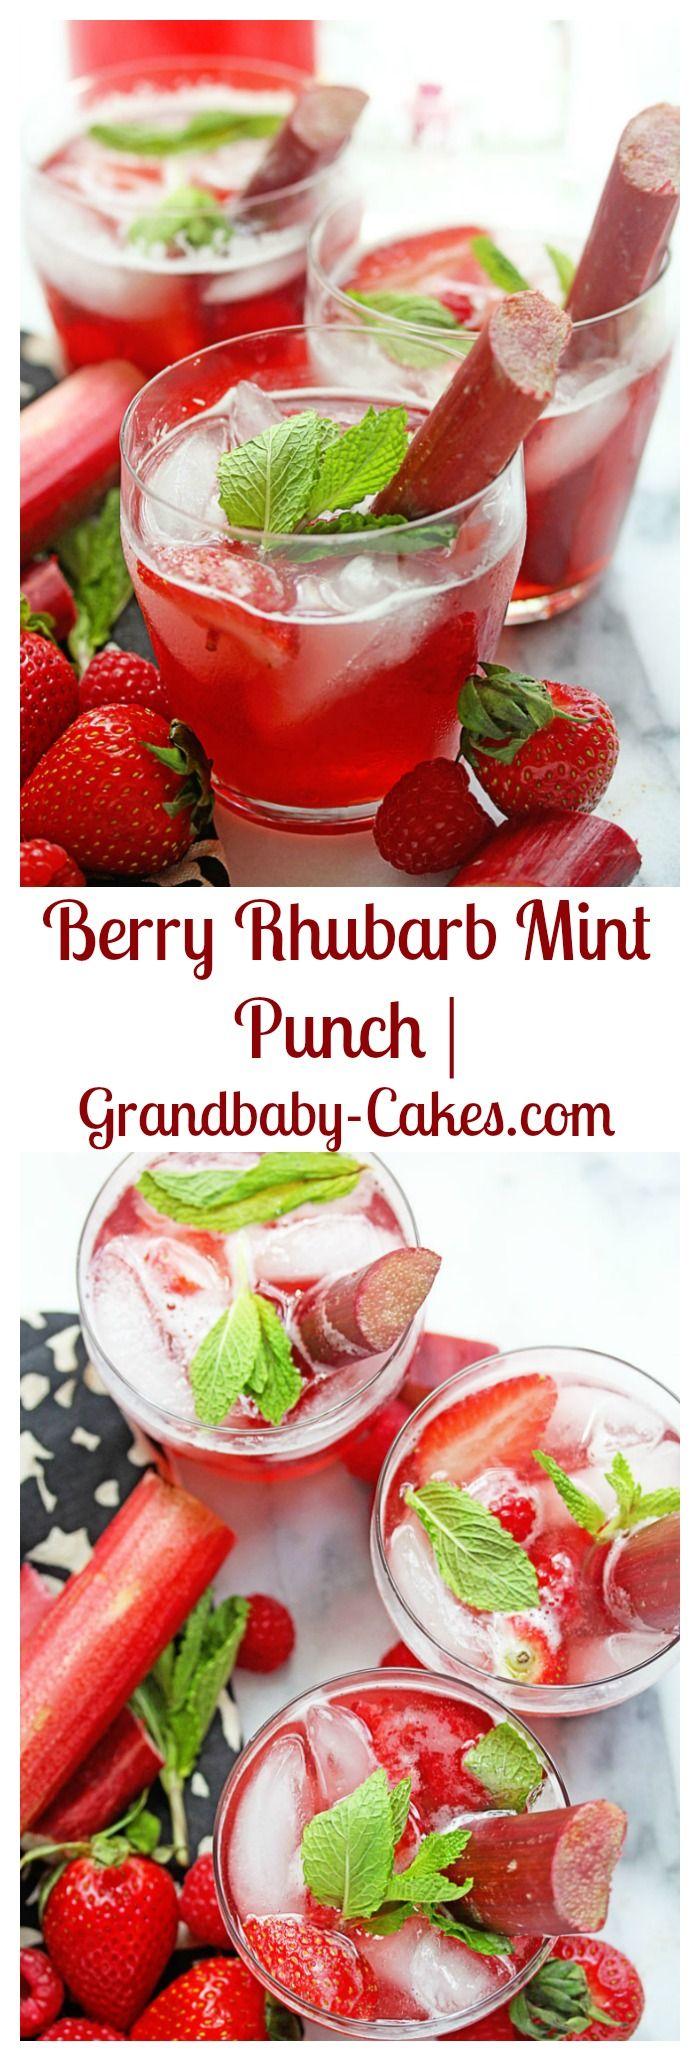 Berry Rhubarb Mint Punch | Grandbaby-Cakes.com